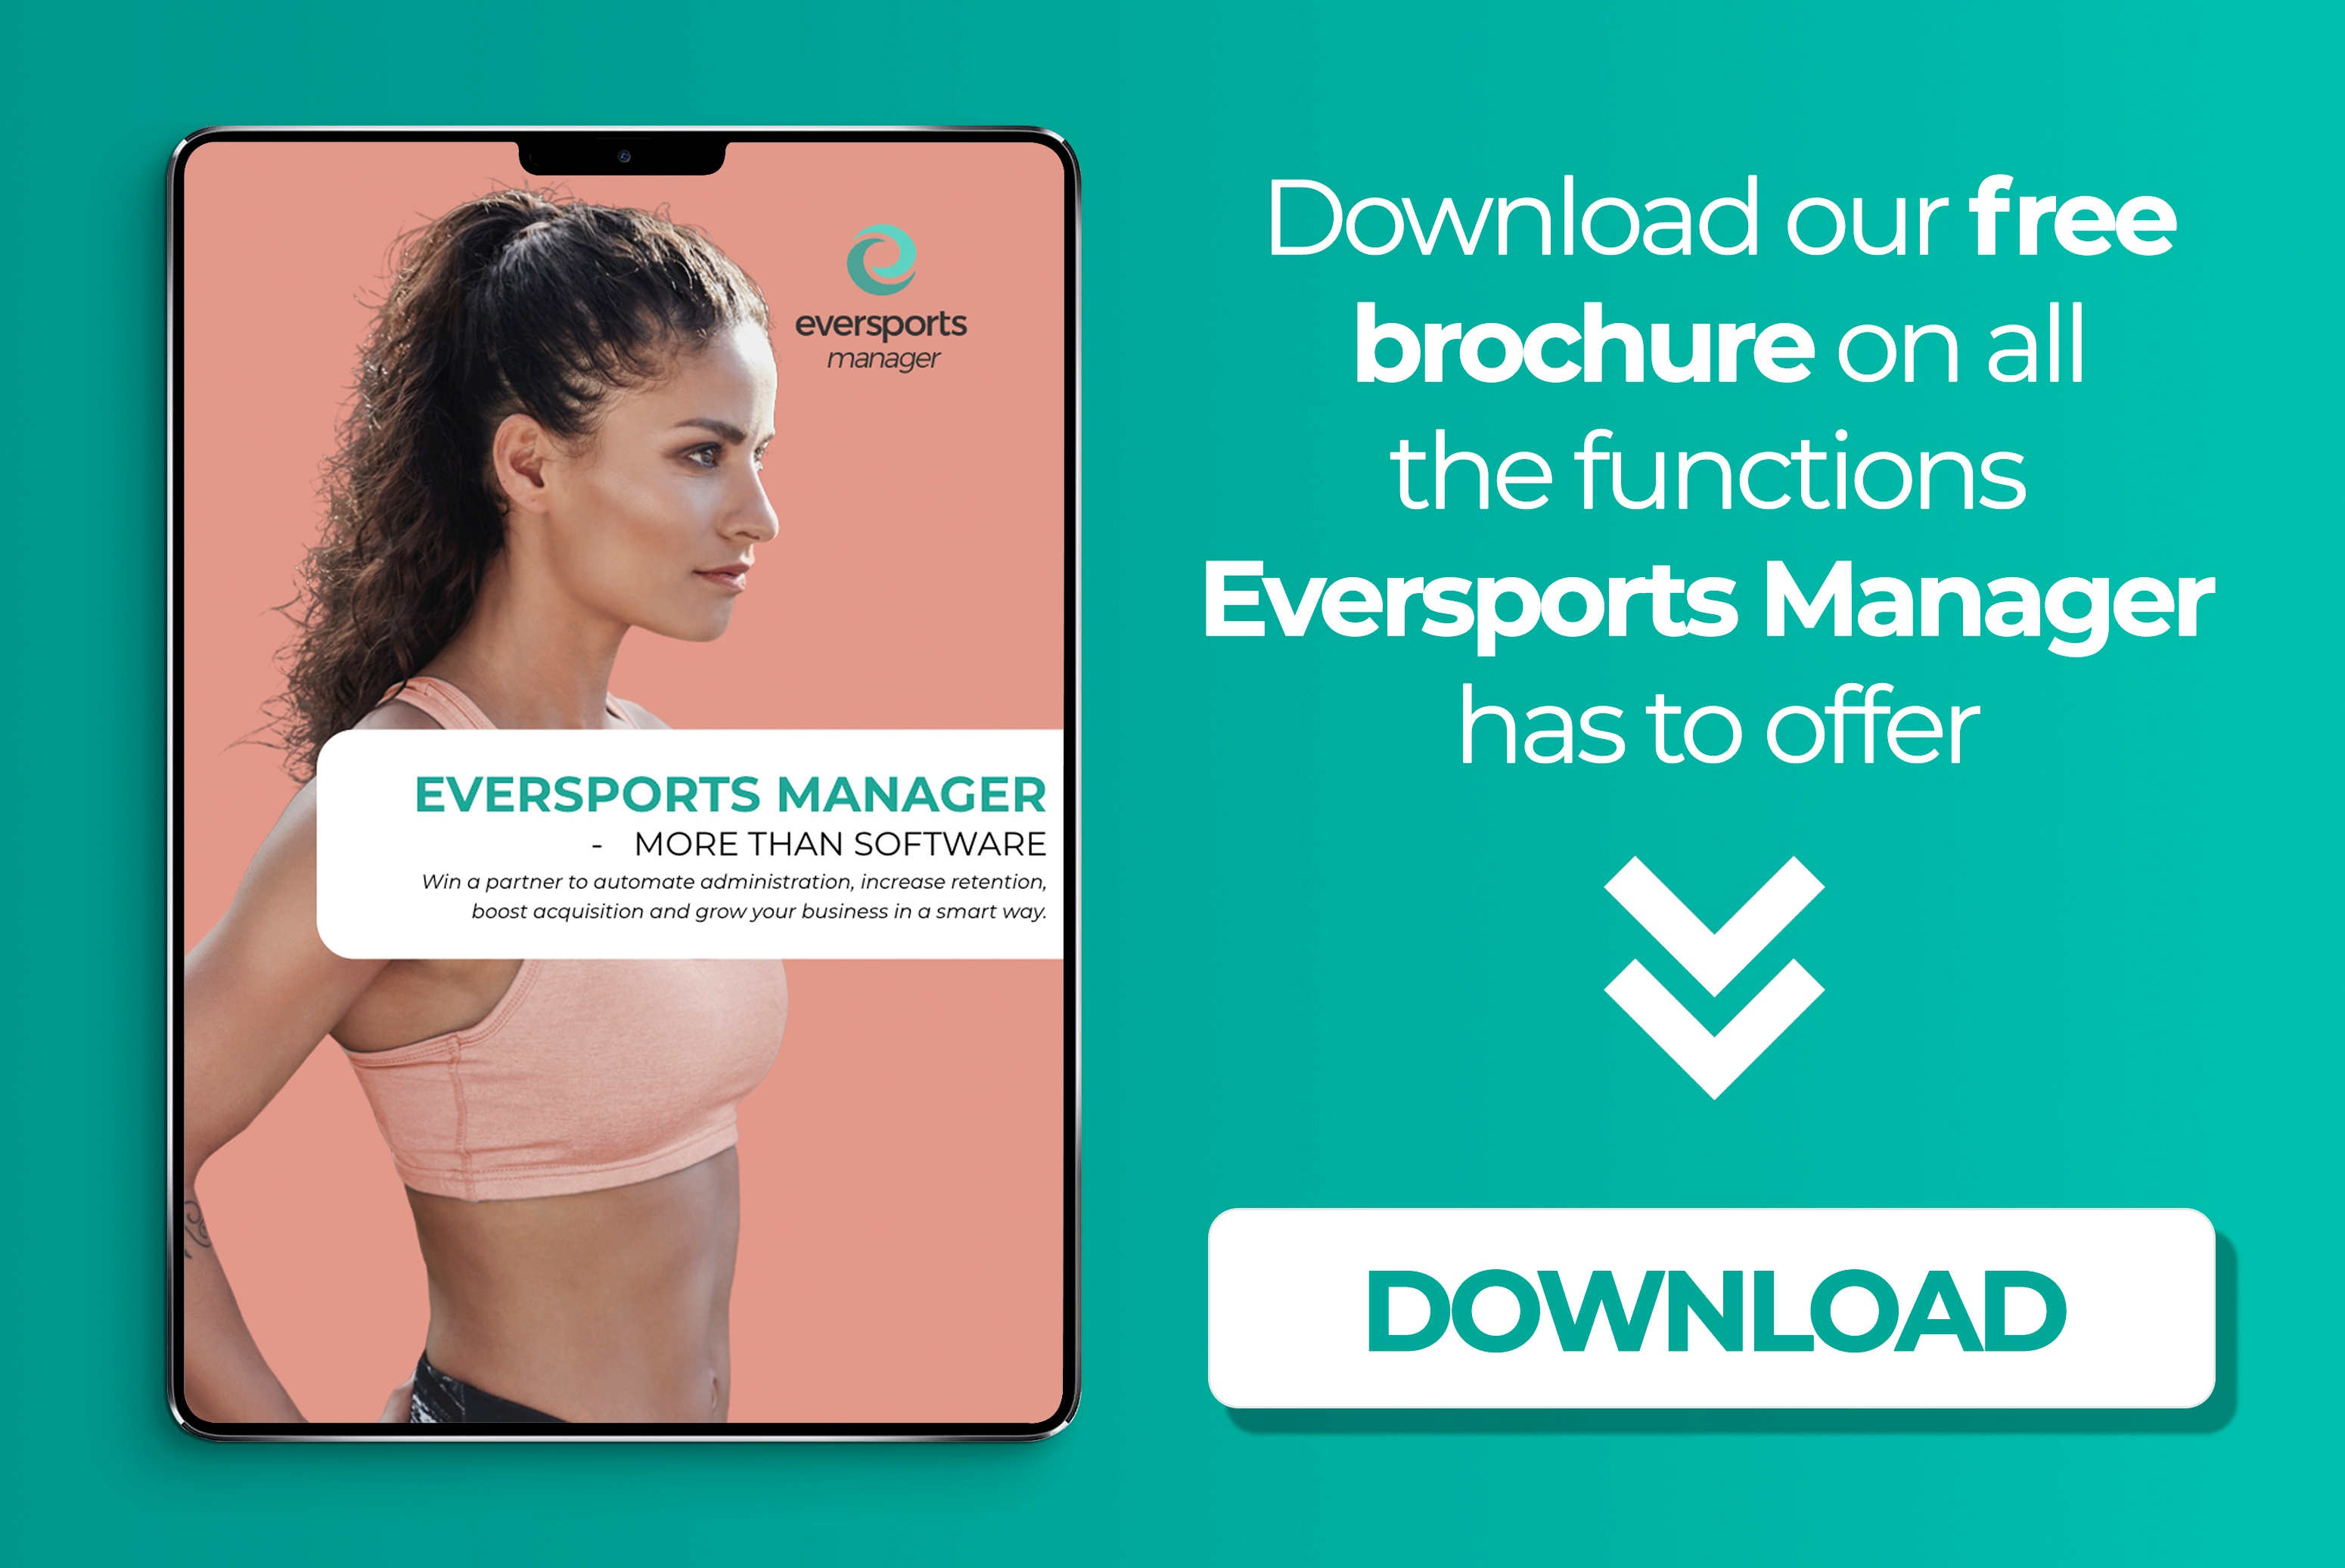 Eversports Manager Factsheet